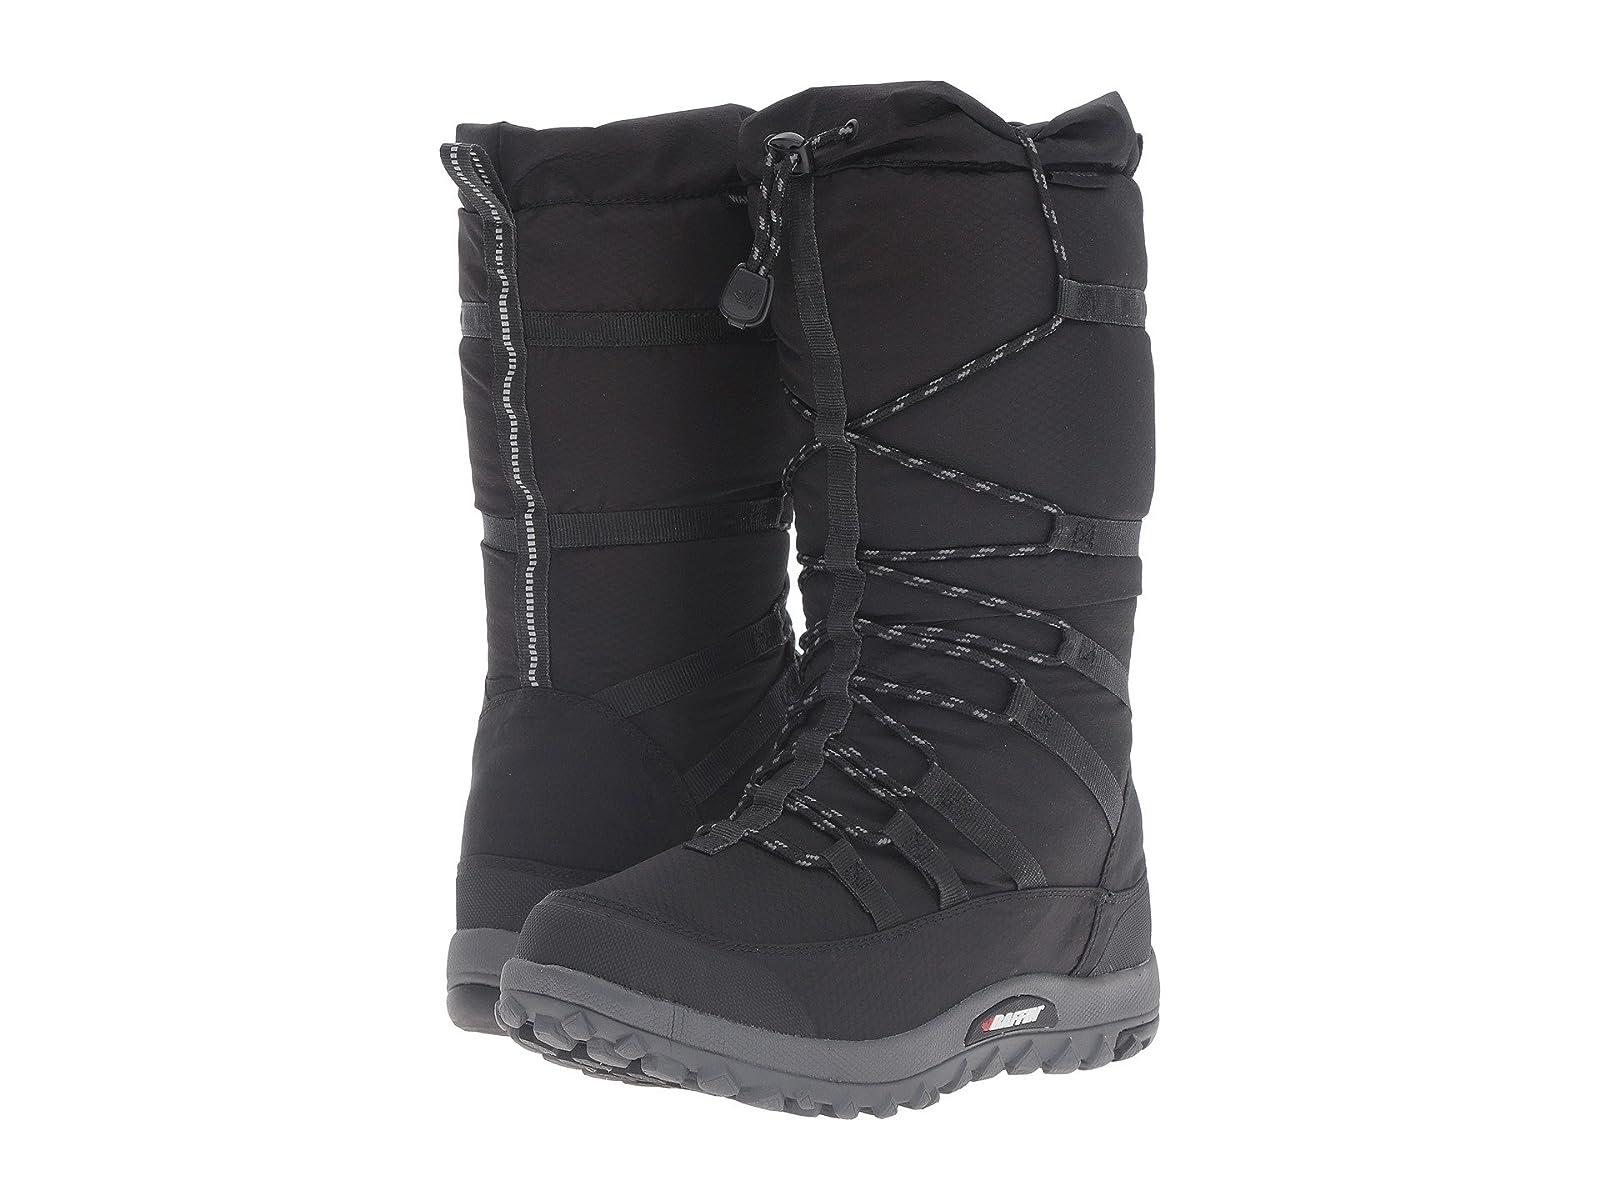 Baffin EscalateSelling fashionable and eye-catching shoes